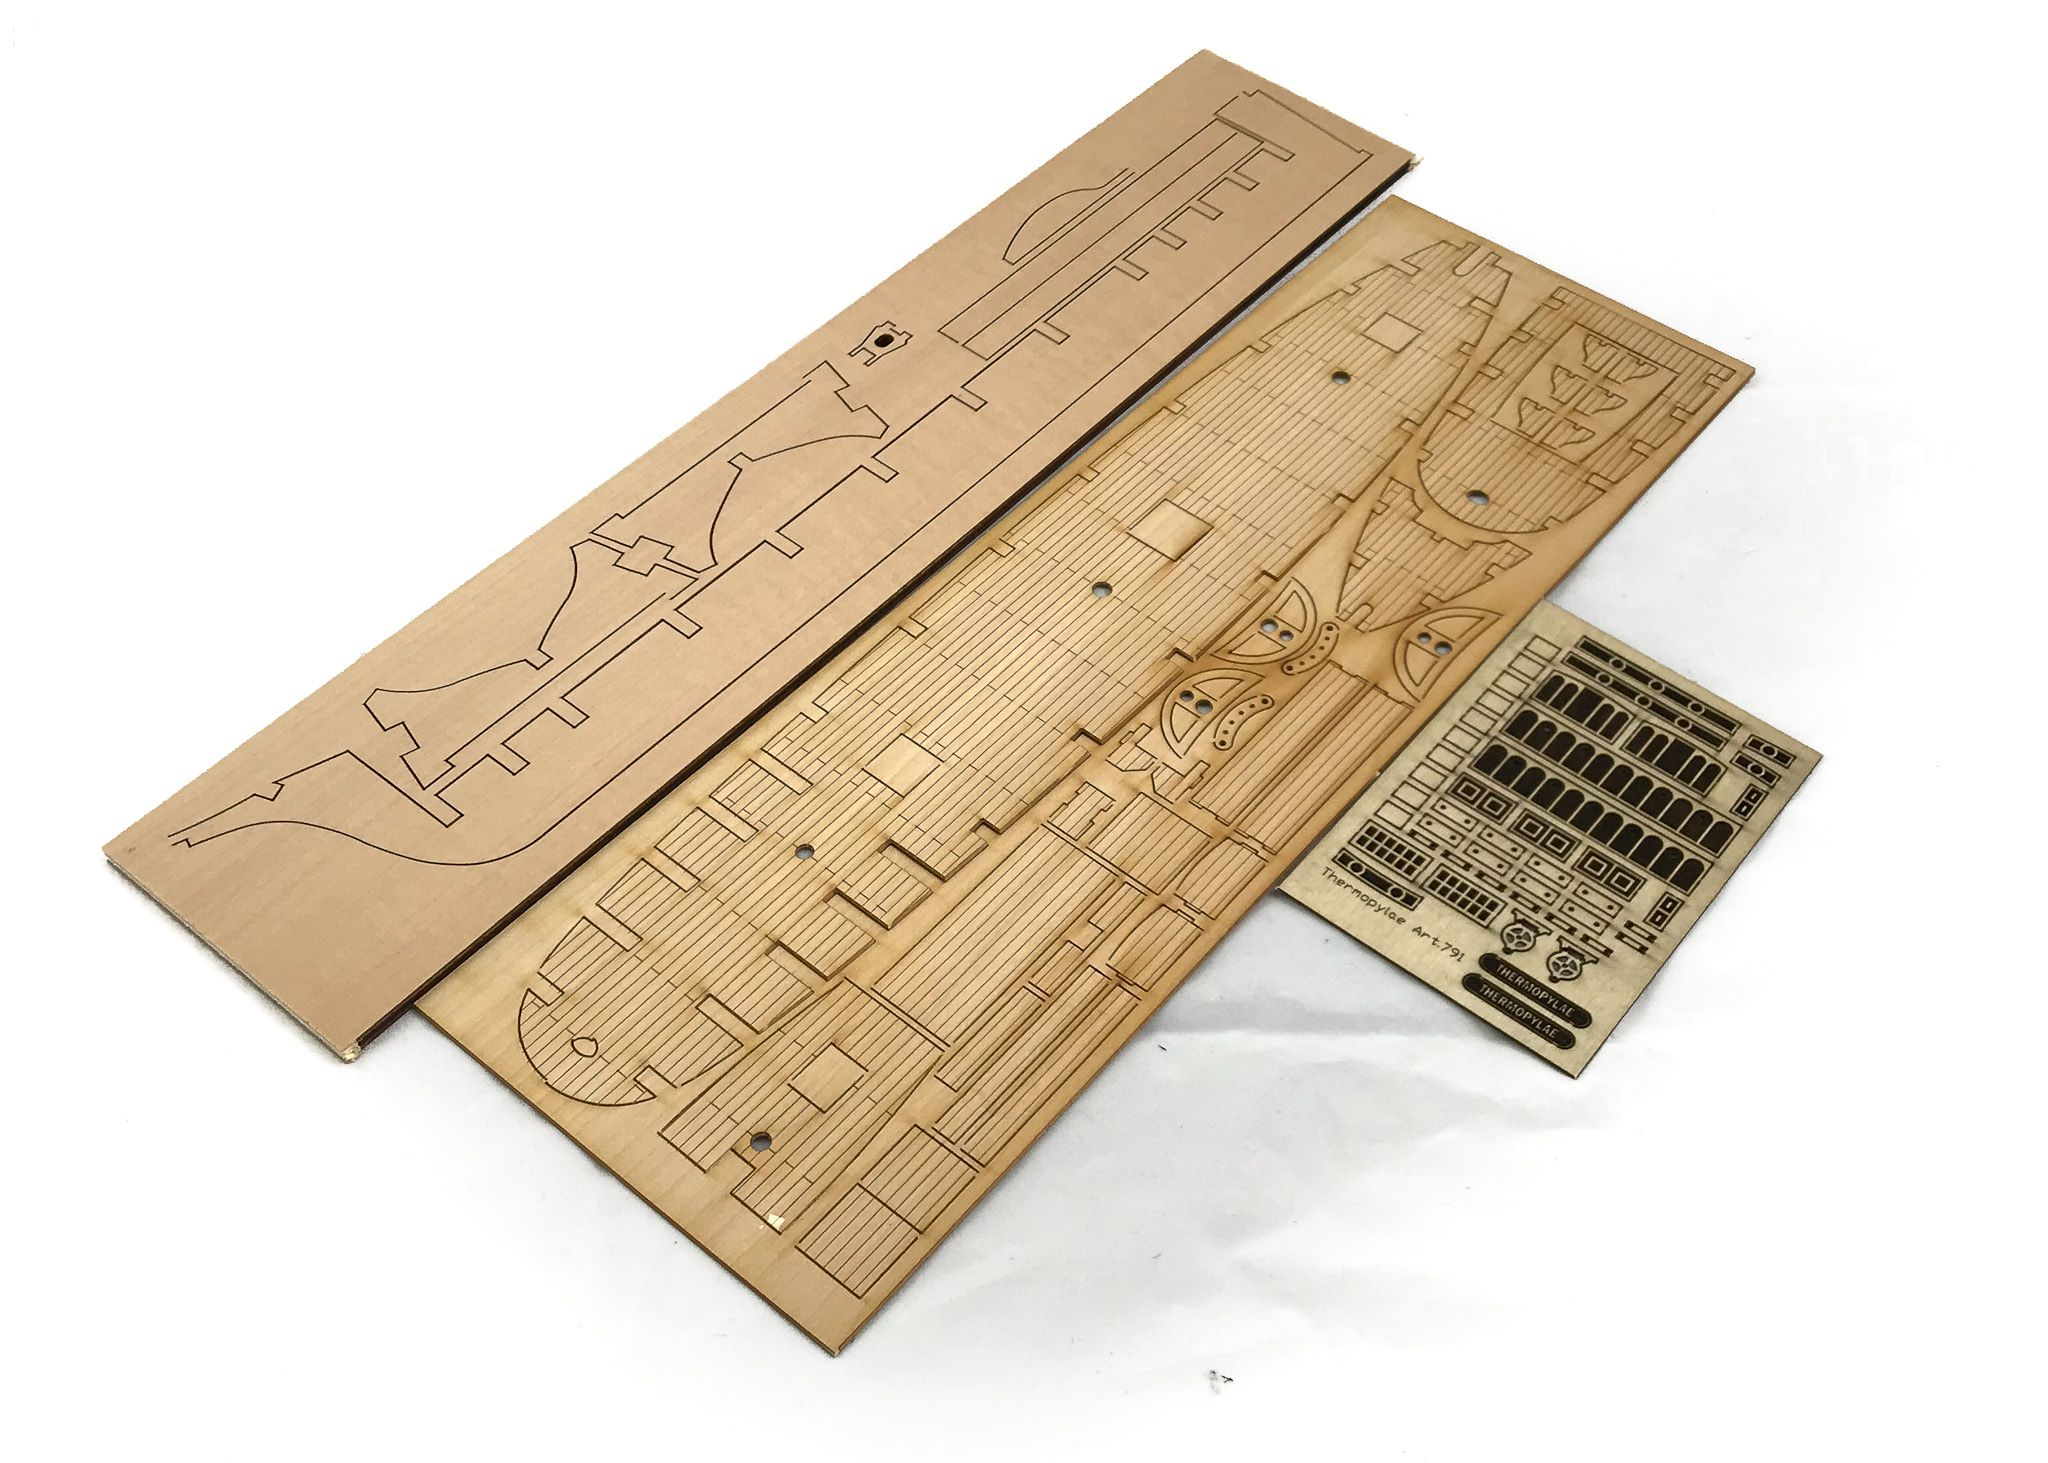 1594-13775-Thermopylae-Model-Ship-Kit-Sergal-791